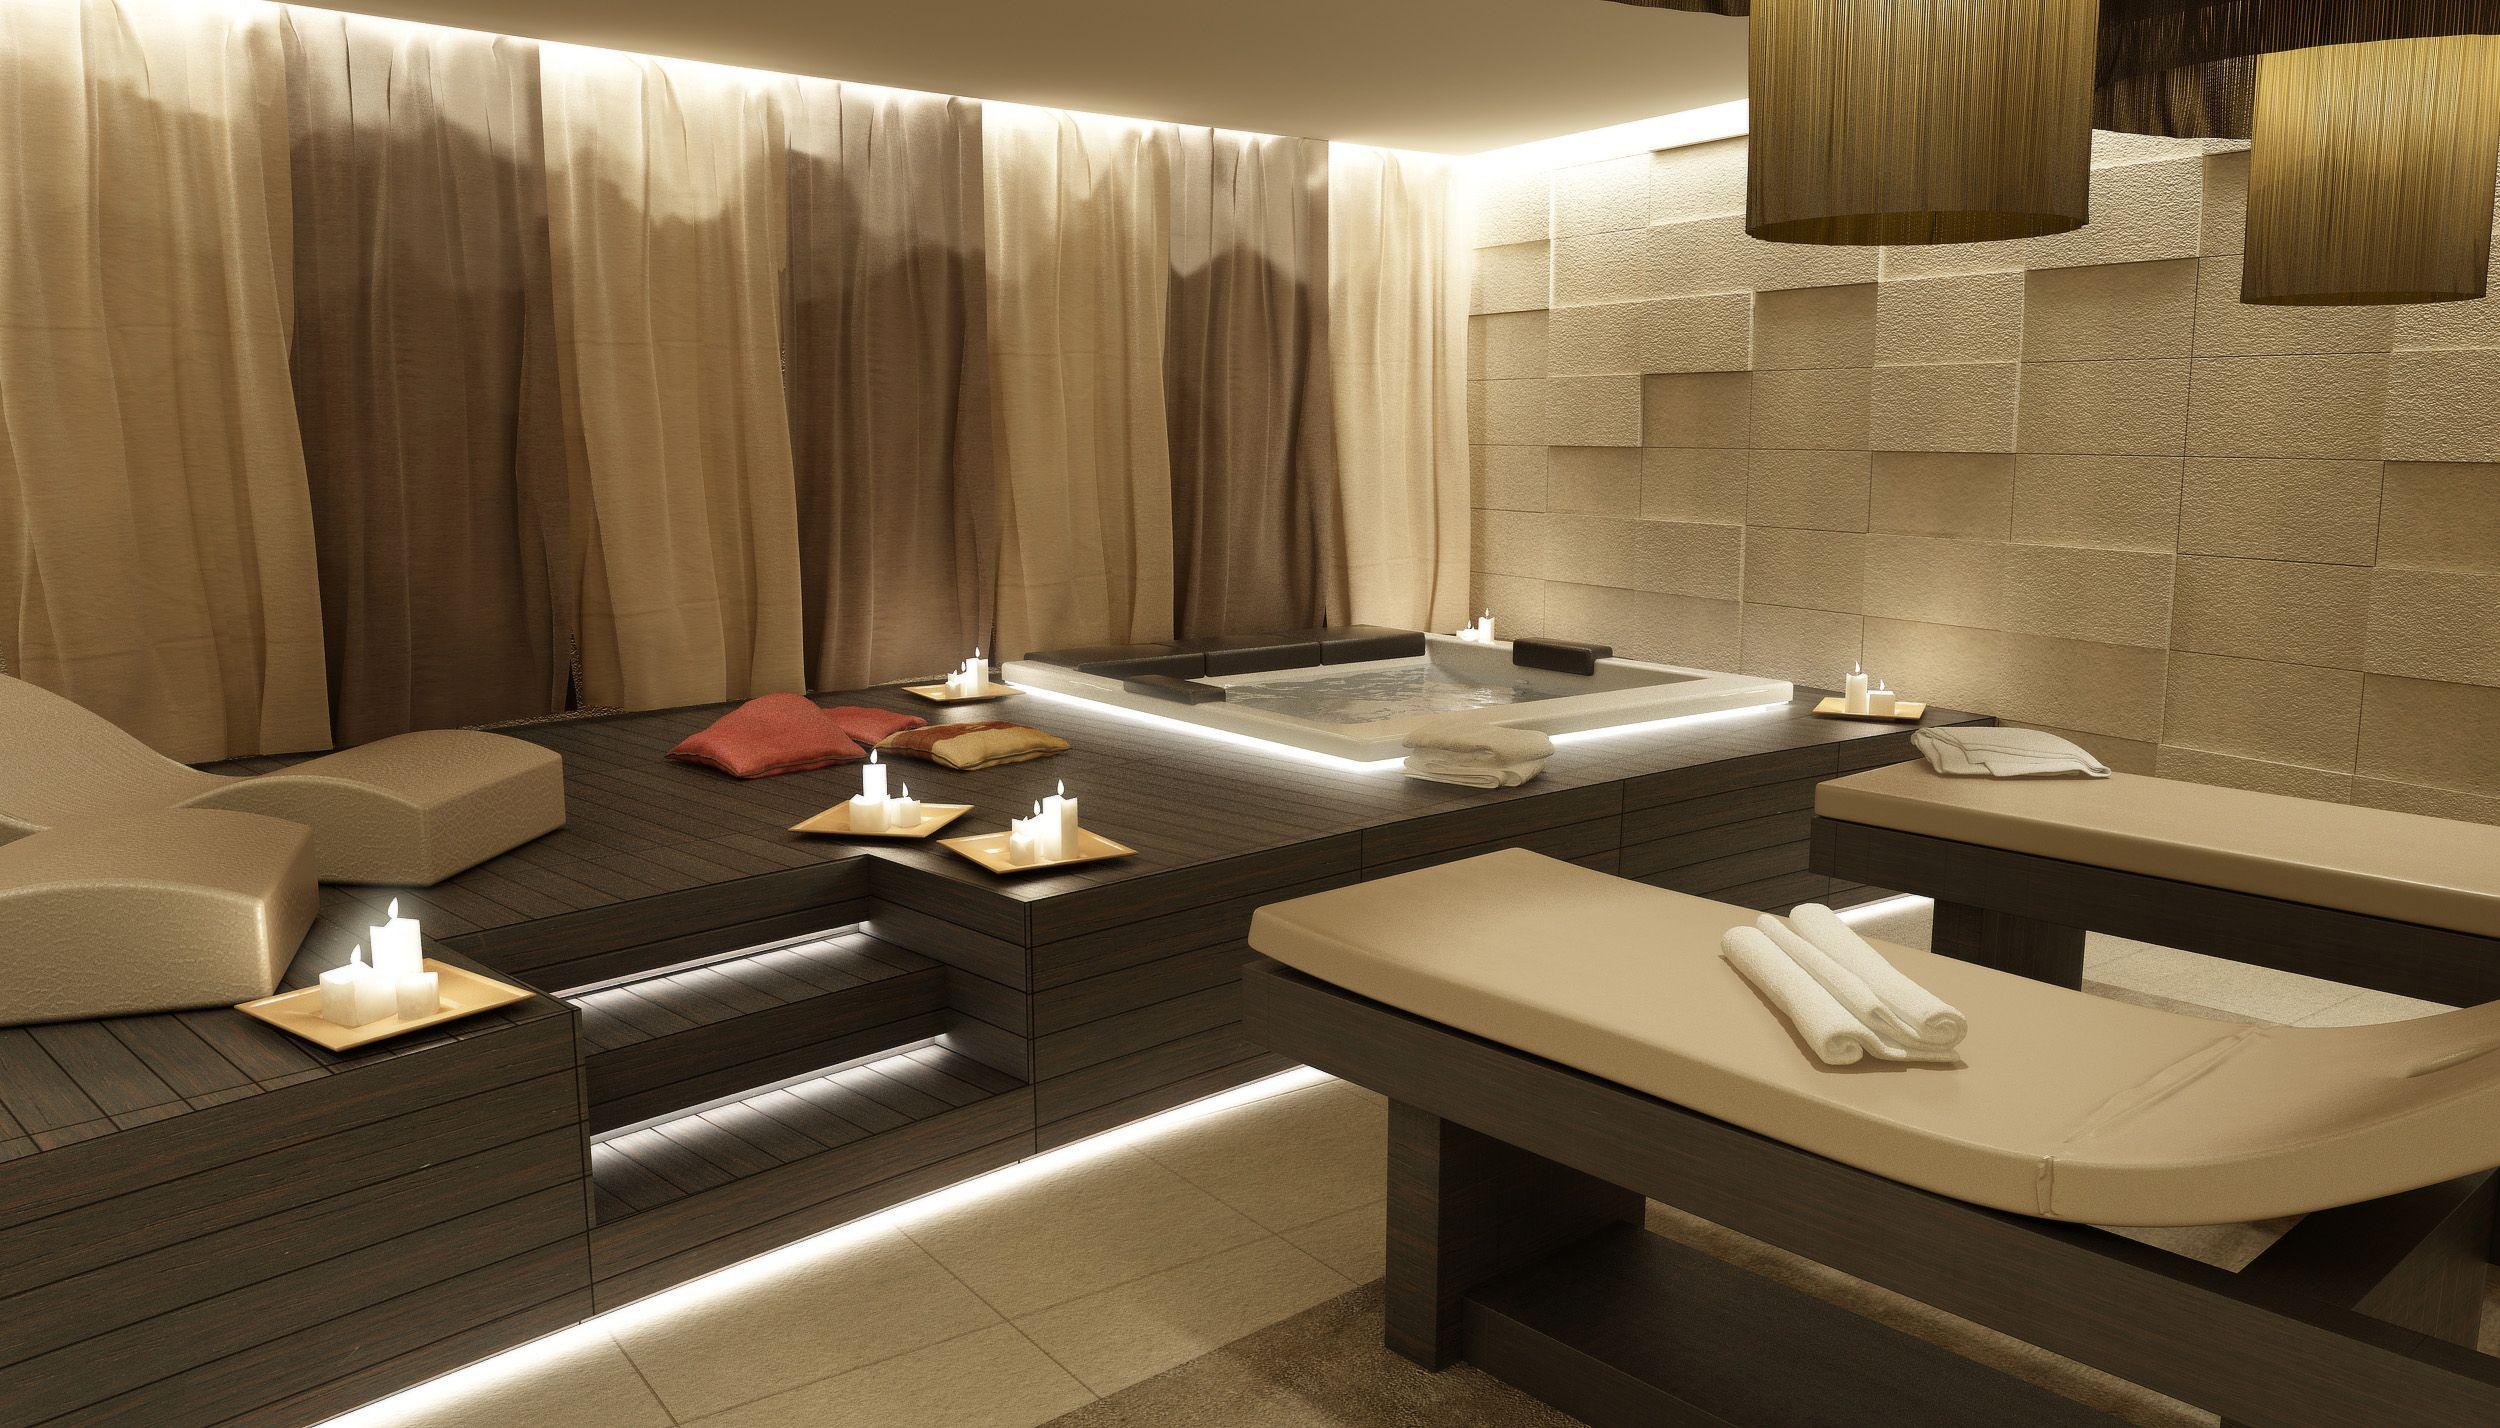 Spa project cerca con google tasty wellness for Luxe decor llp